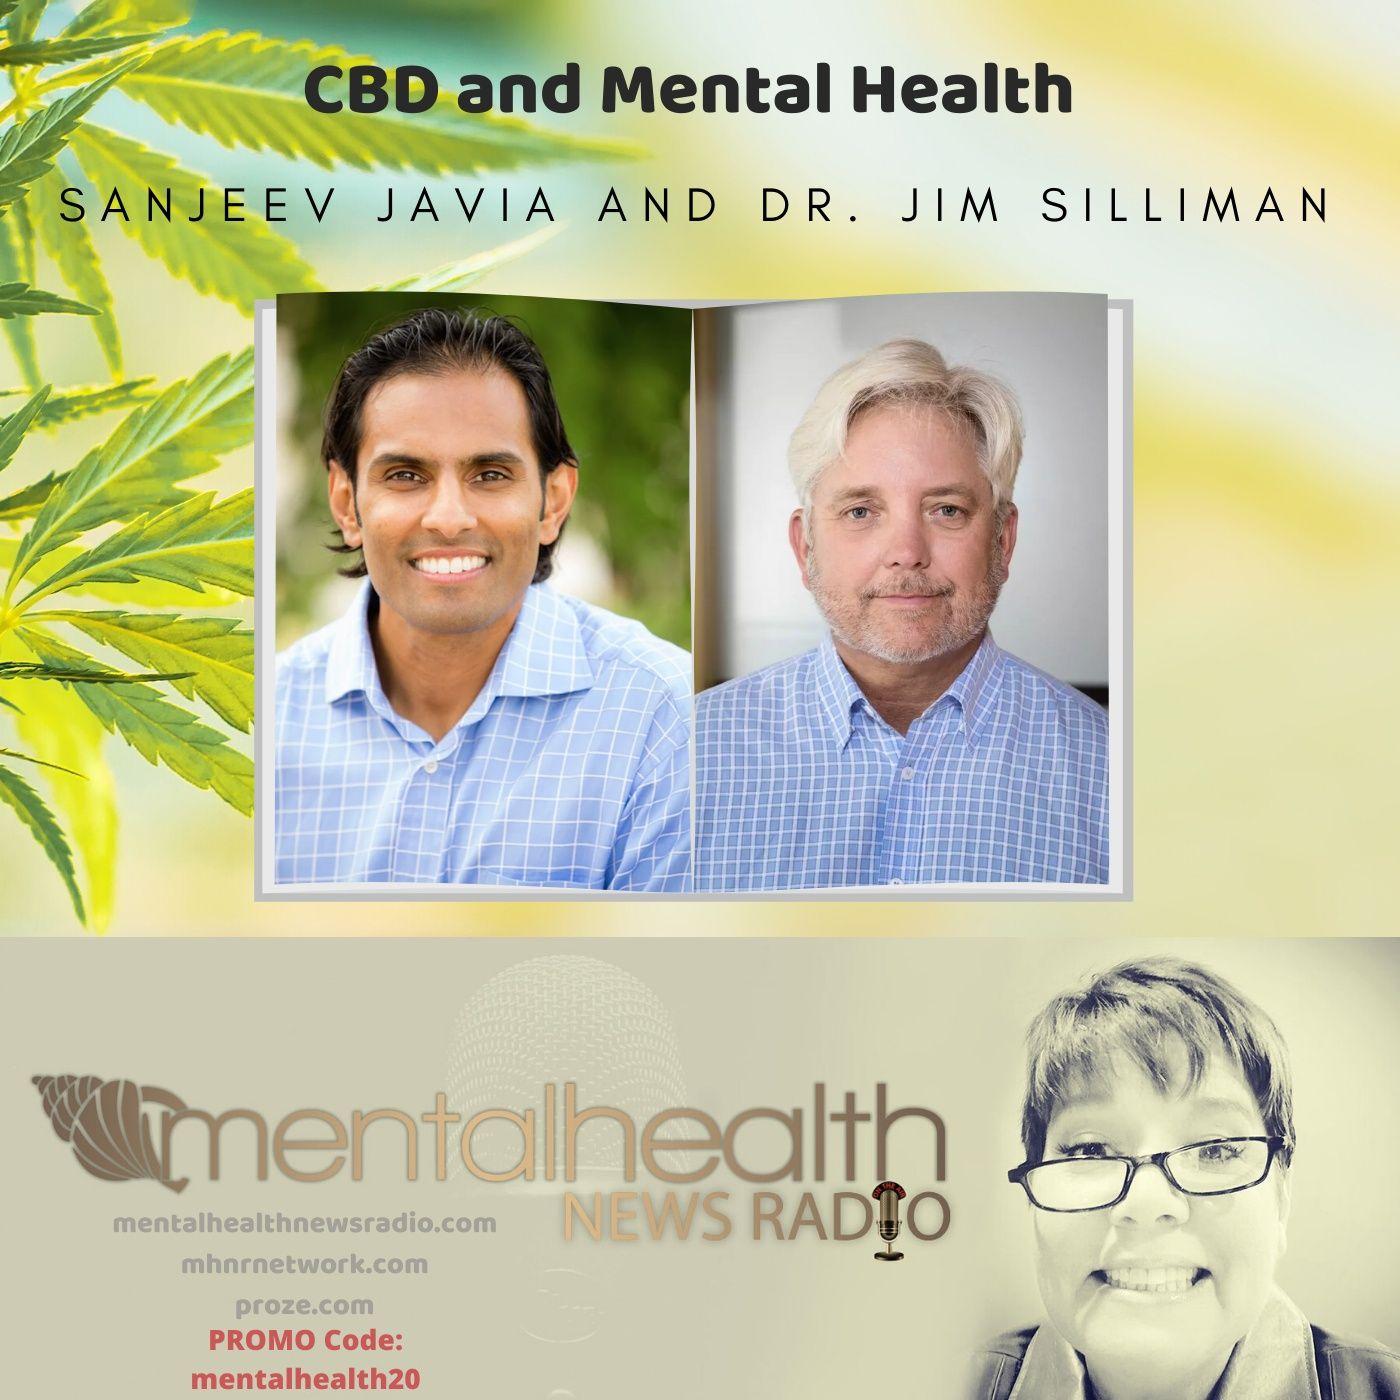 Mental Health News Radio - CBD and Mental Health